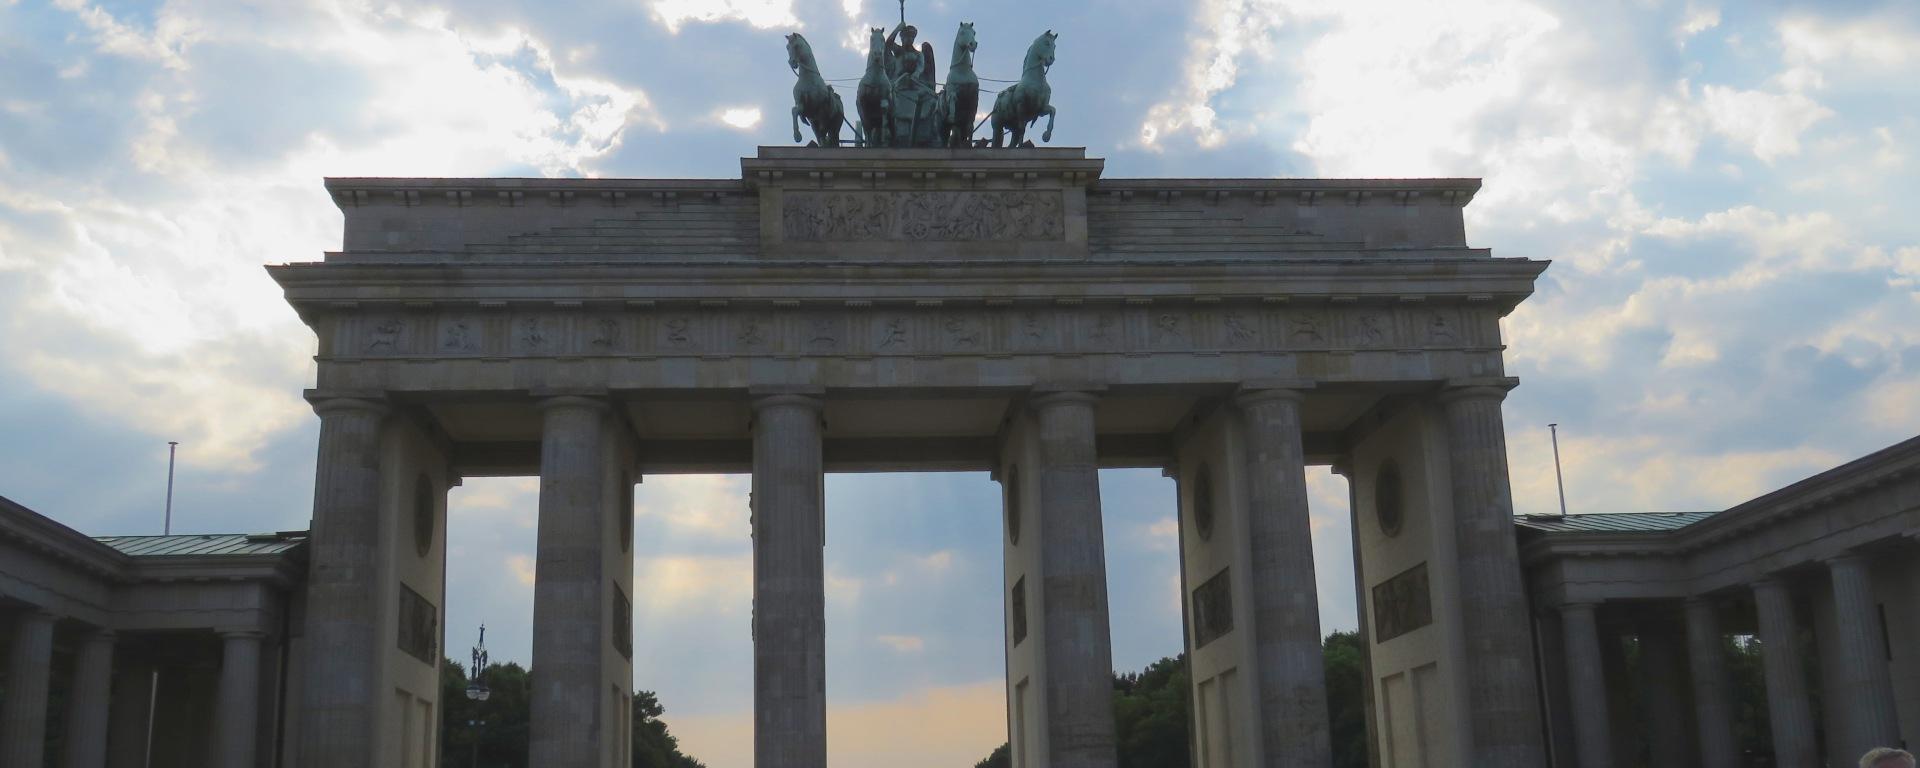 Brandenburg Gate Berlin - Read on at www.beautifulfillment.com